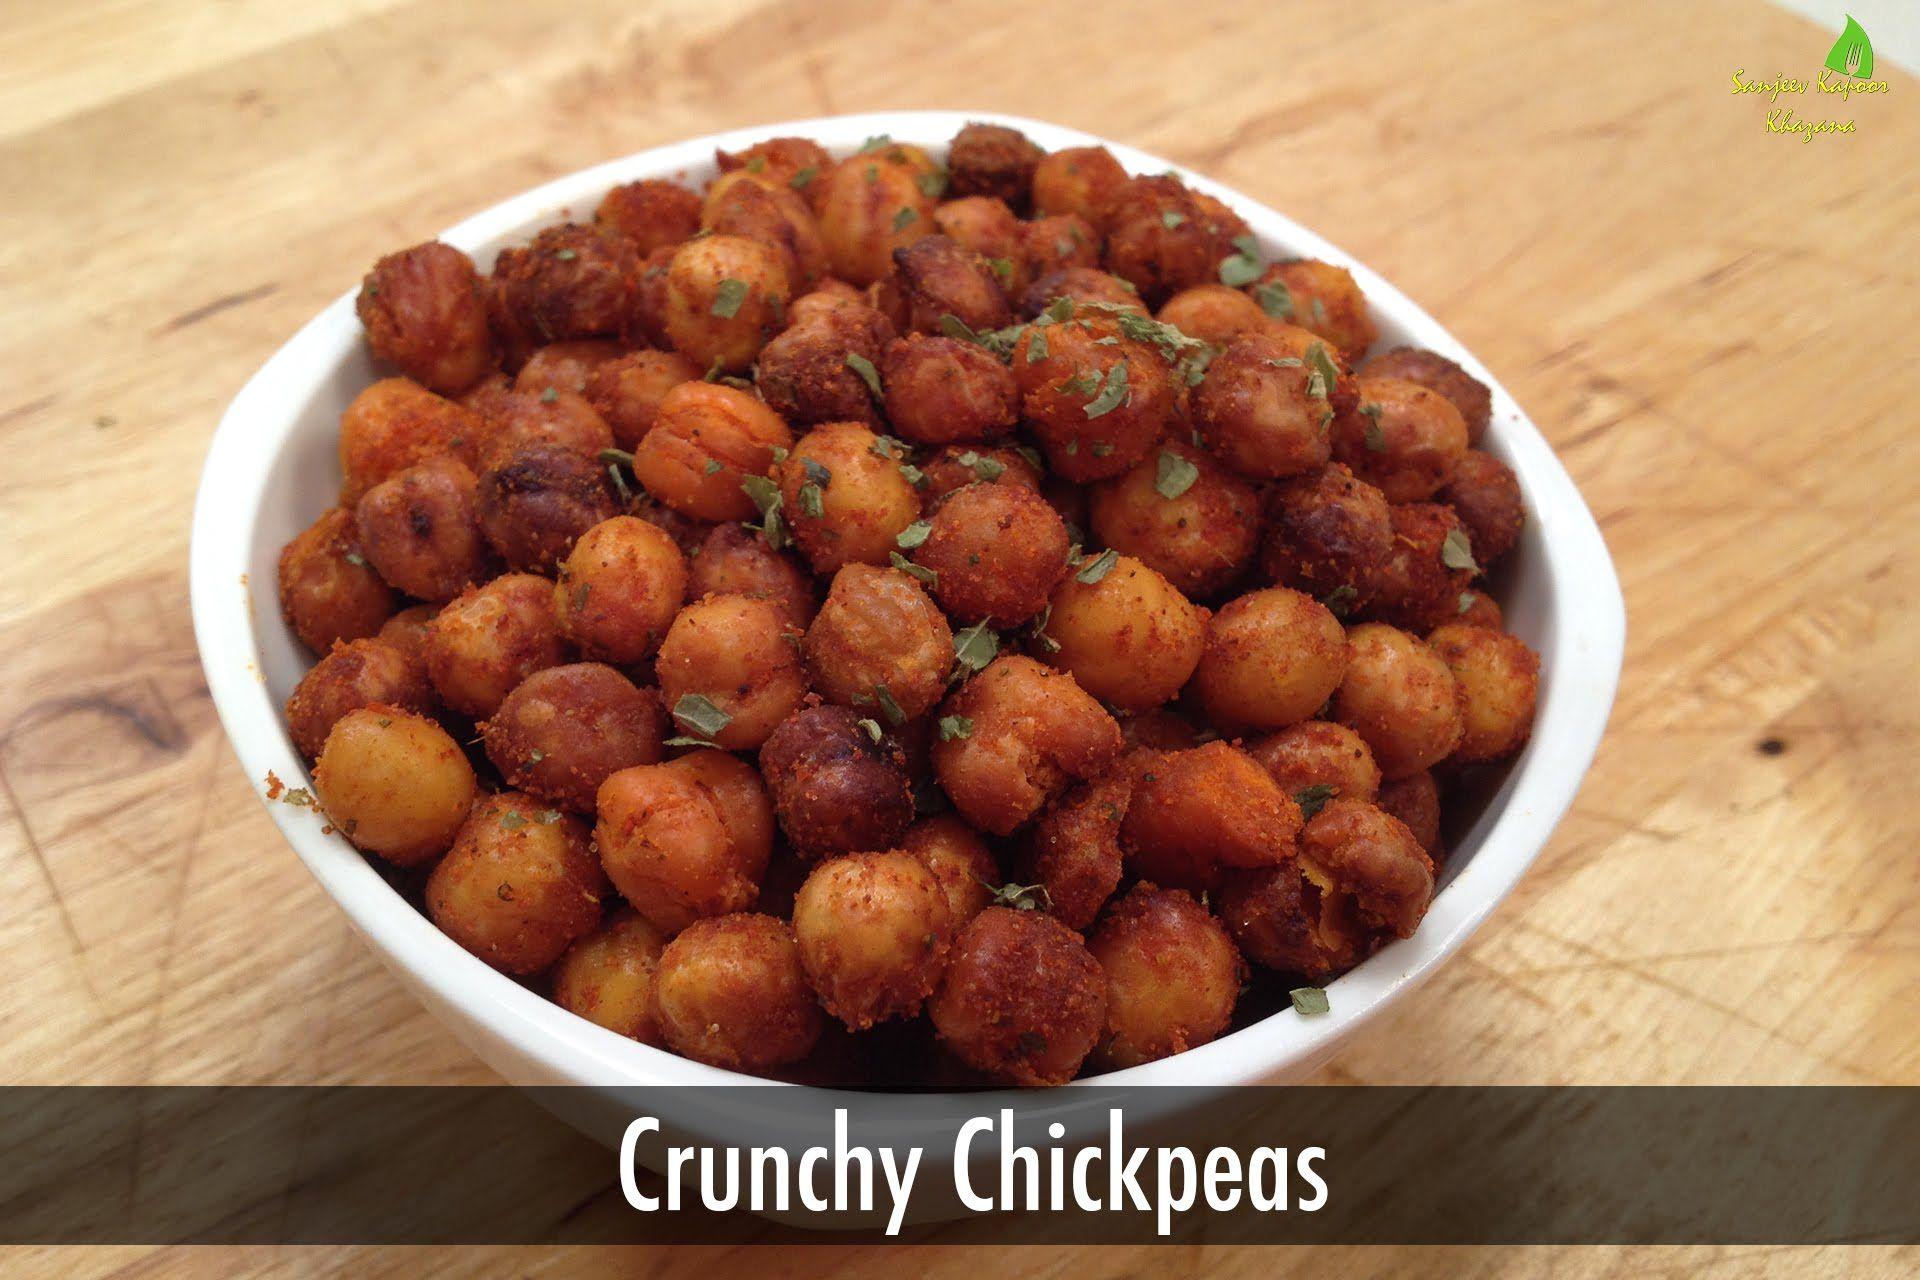 Crunchy chickpeas sanjeev kapoor khazana youtube food food crunchy chickpeas sanjeev kapoor forumfinder Gallery